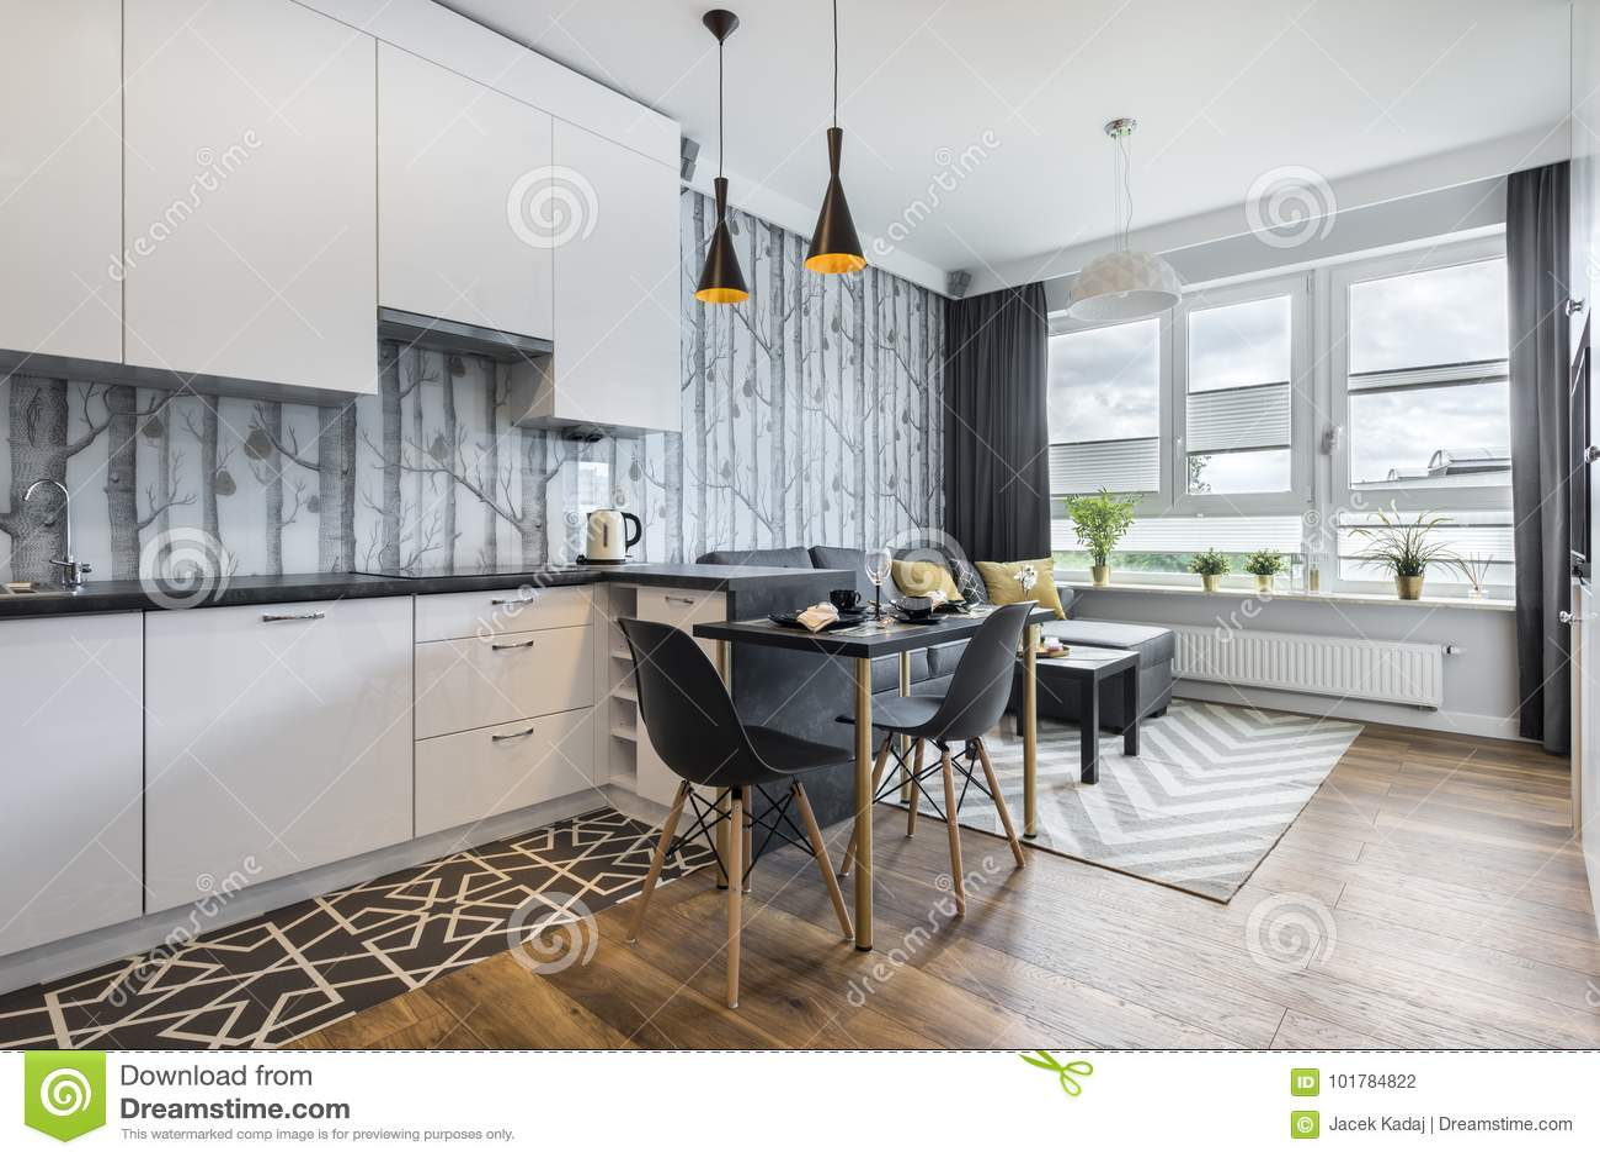 Keuken Kleine Ruimte : Keukens voor kleine ruimtes kookeiland greeploze keuken wit